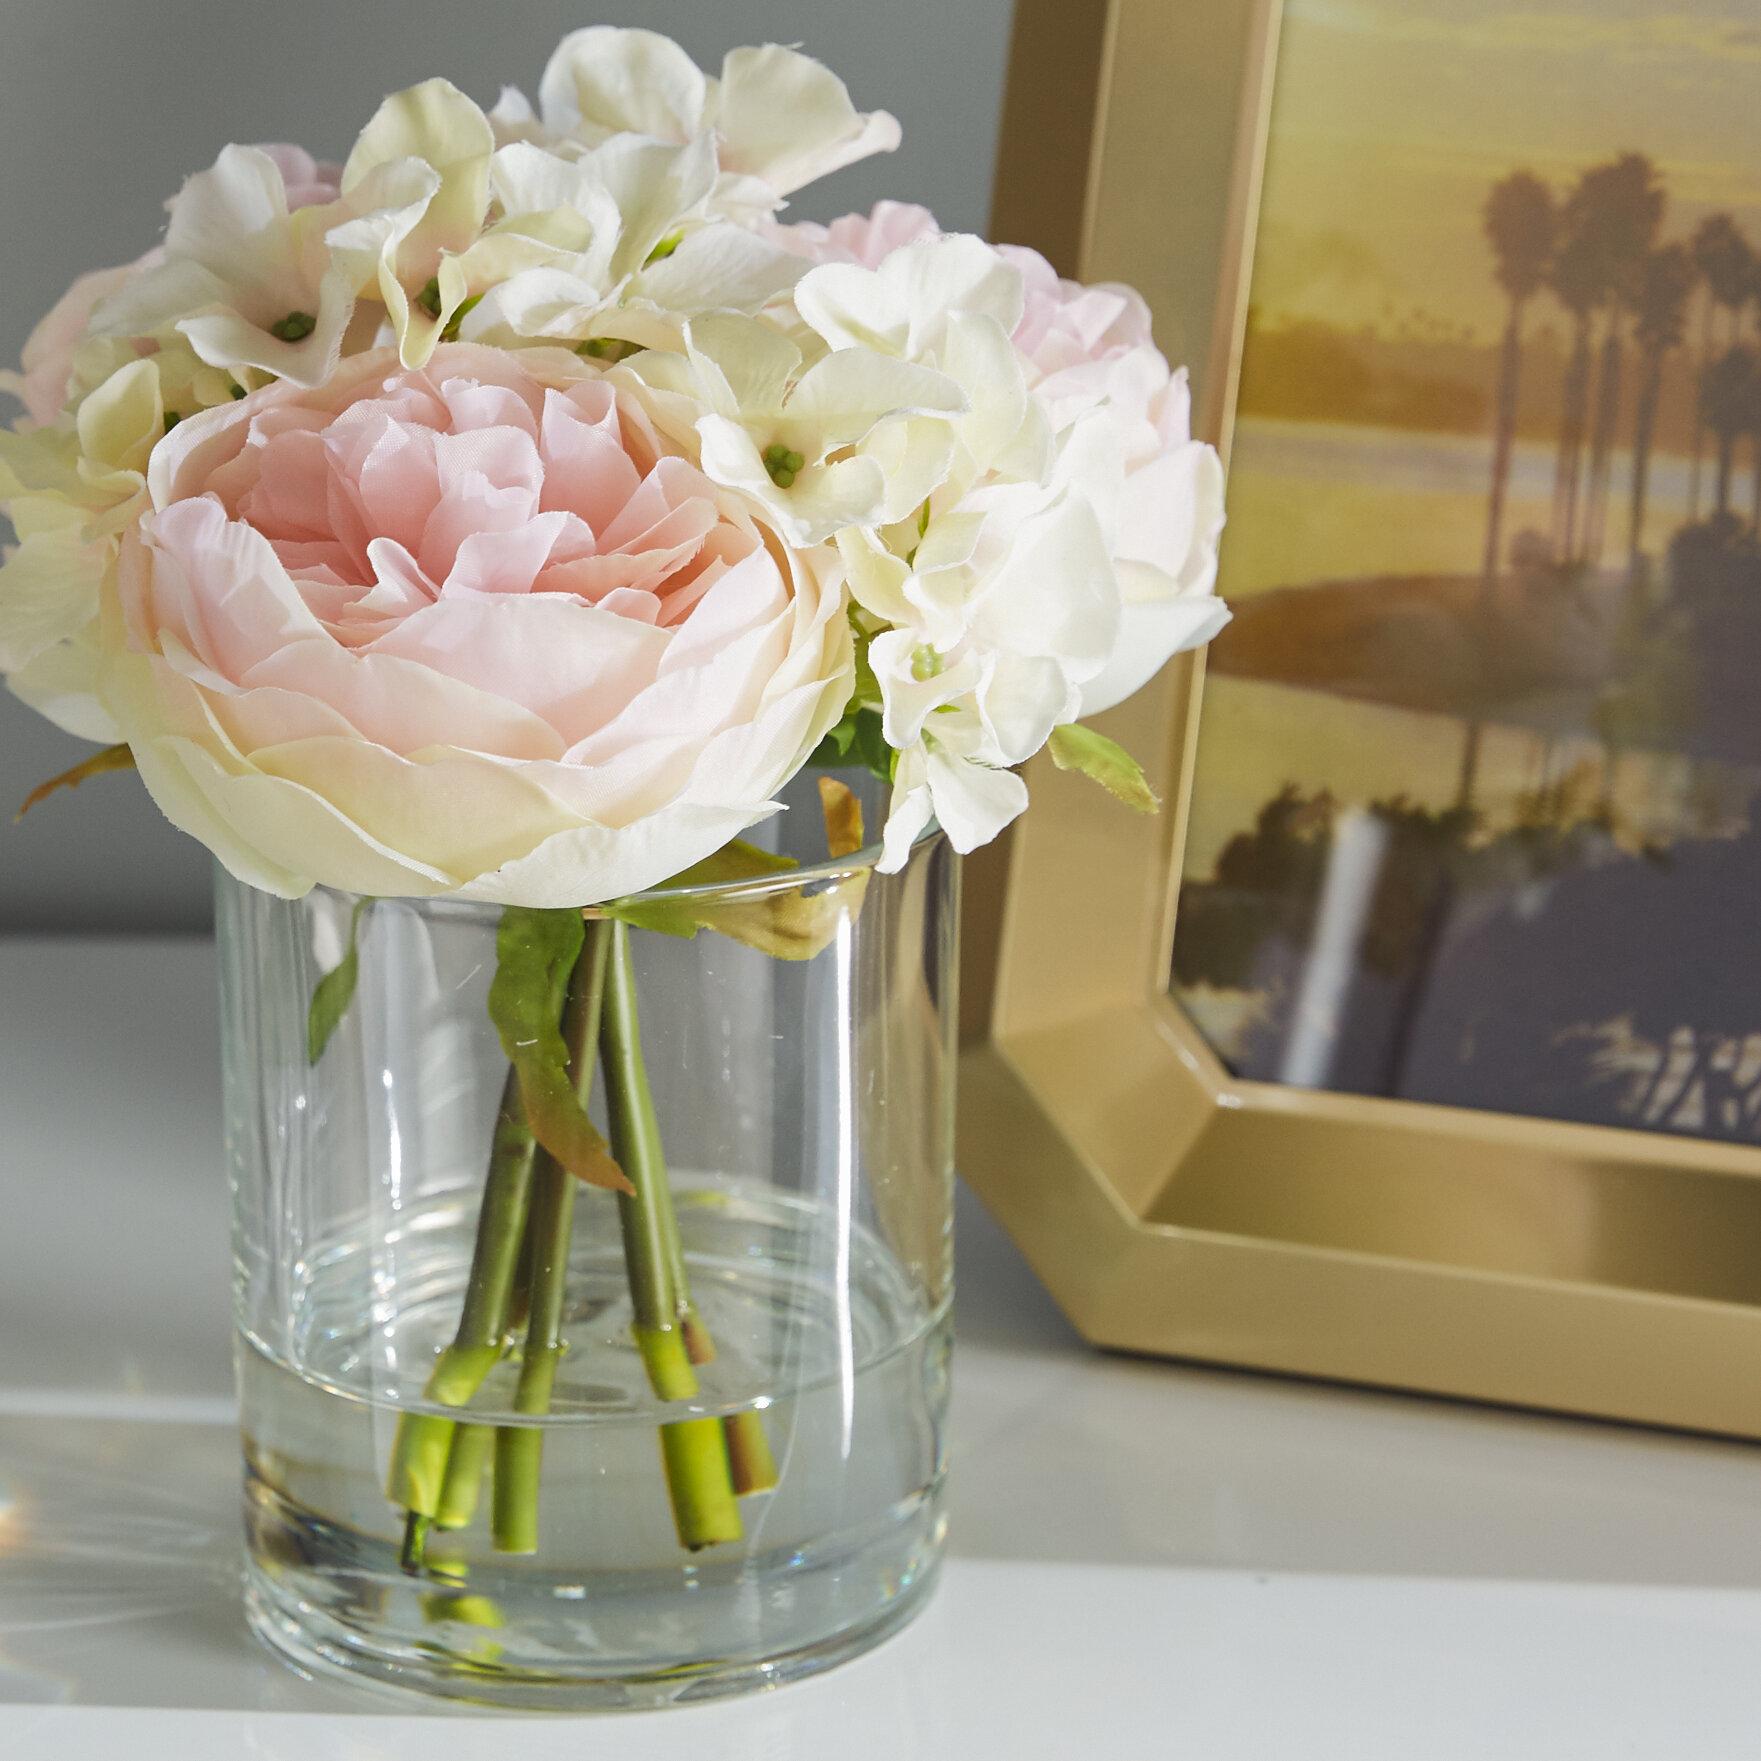 Willa Arlo Interiors Hydrangea And Rose Floral Arrangement In Glass Vase Reviews Wayfair